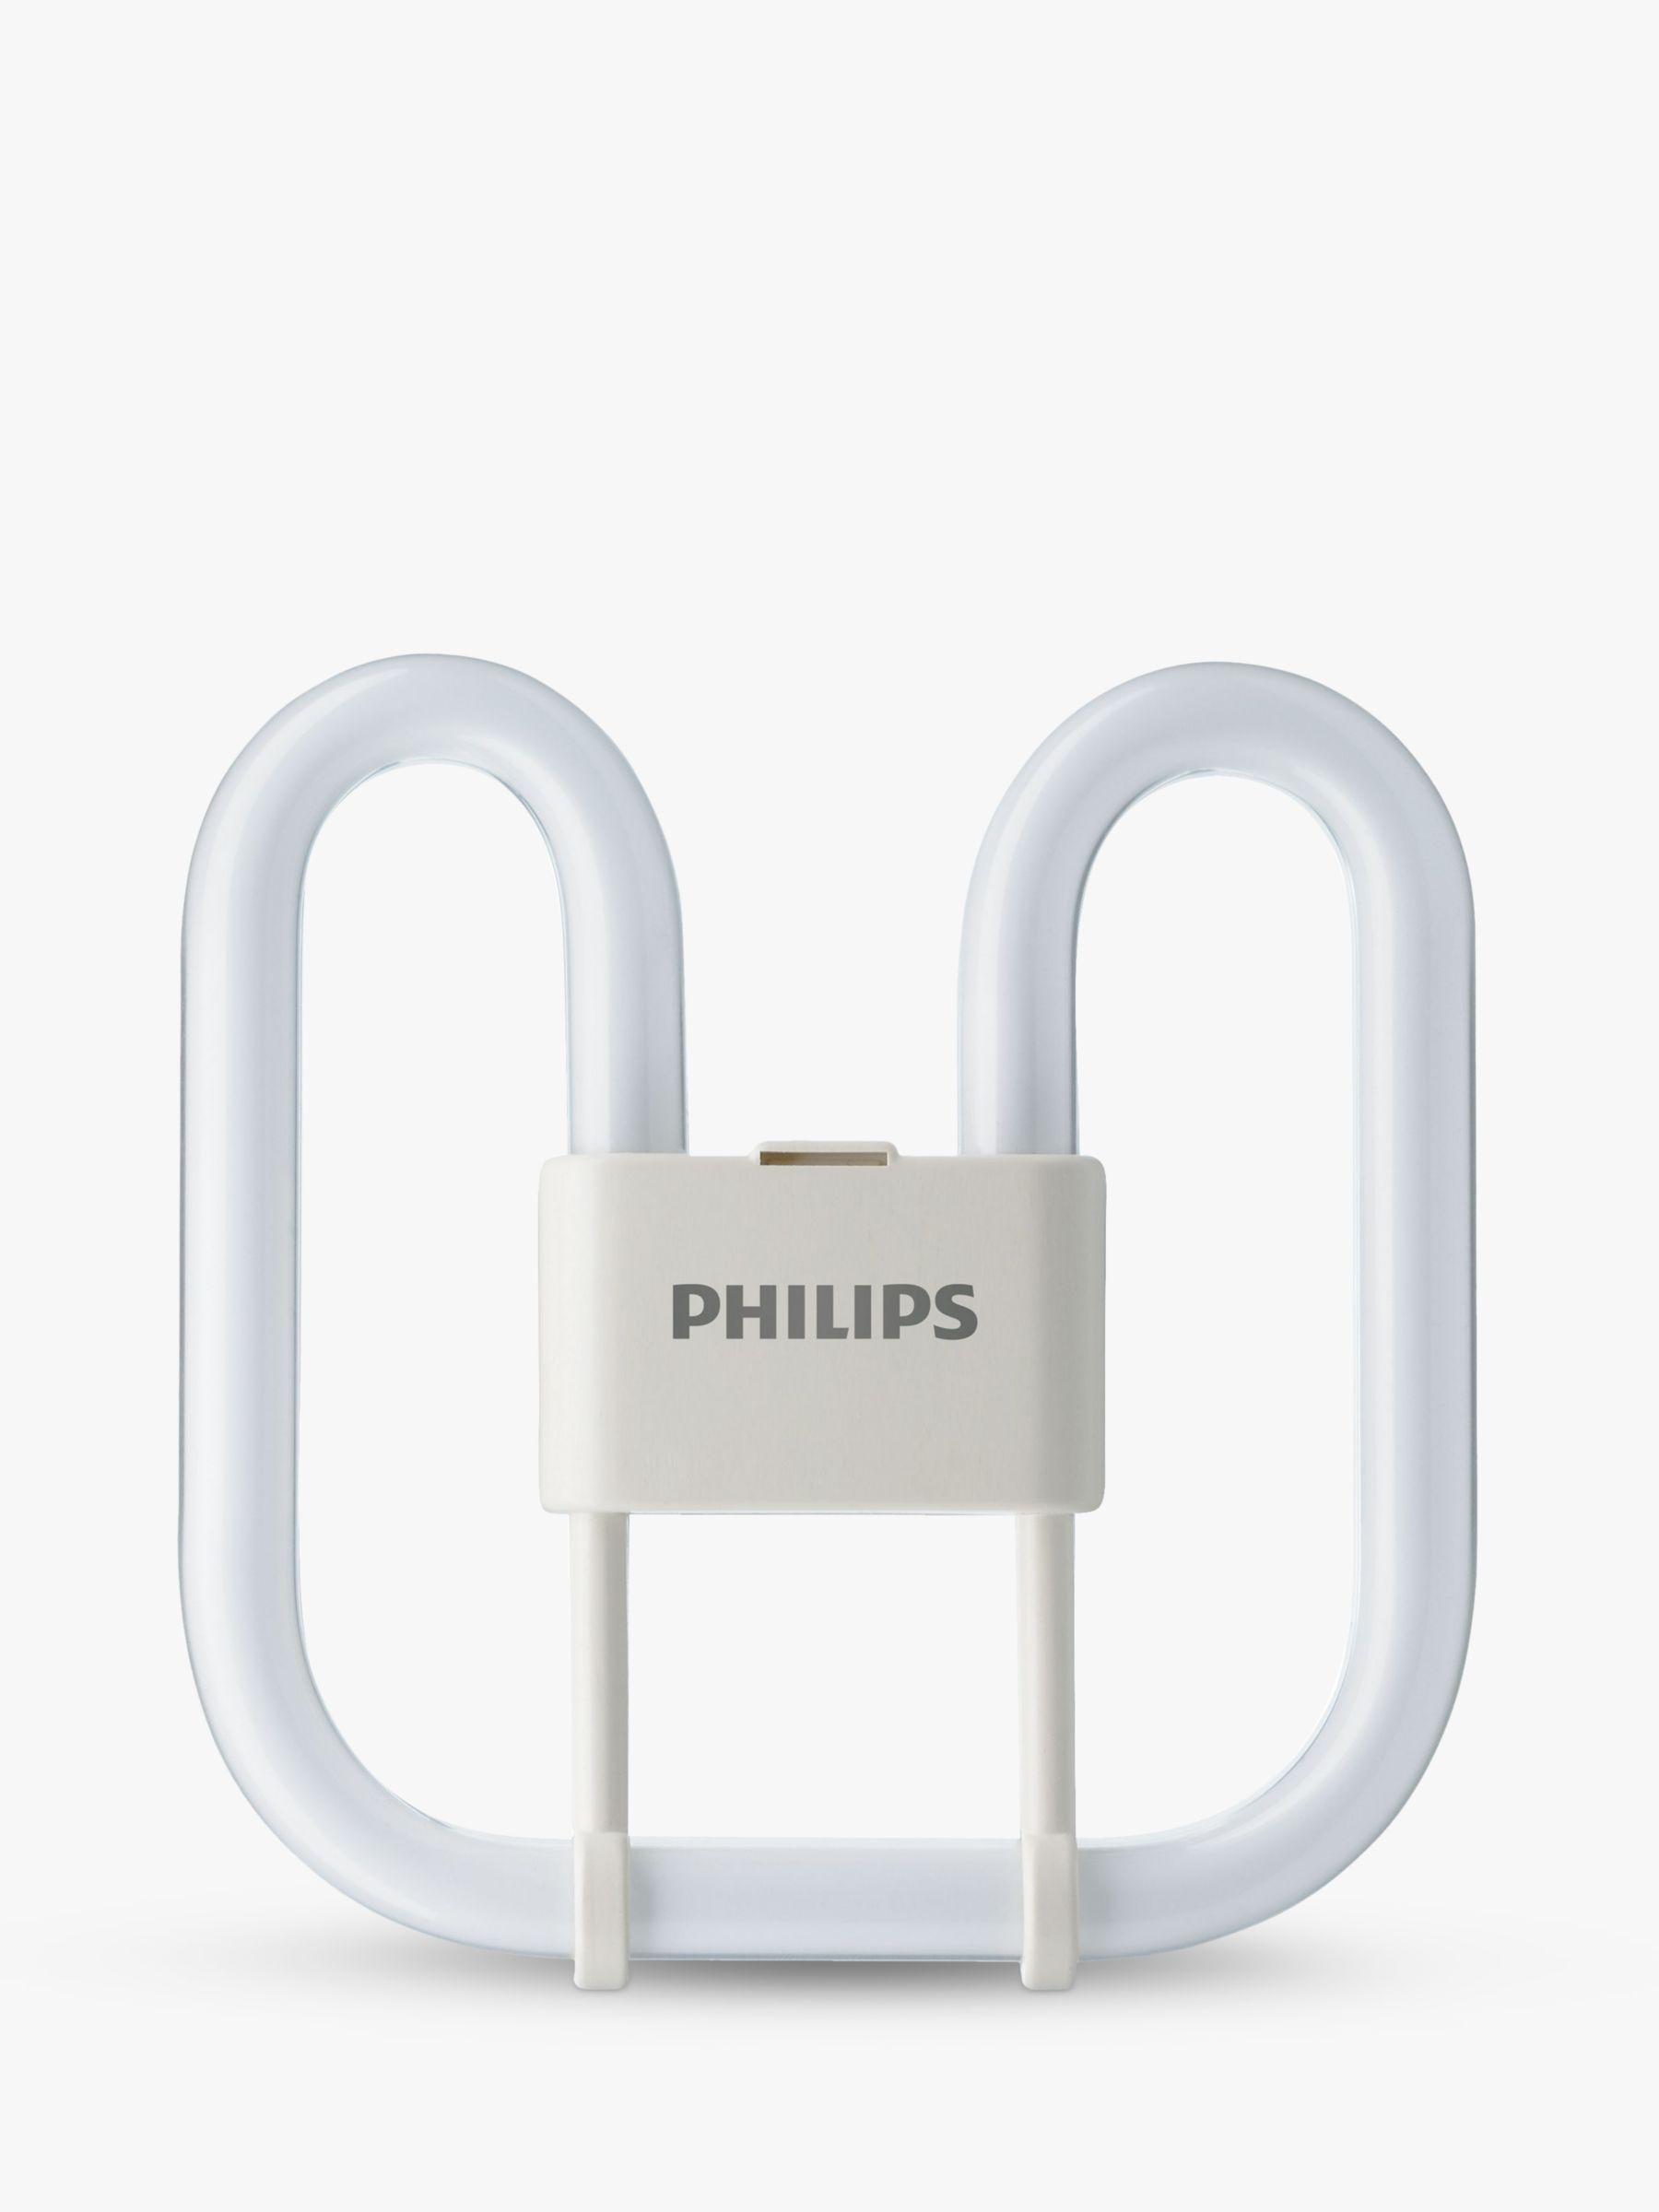 Philips 28w Gr10q4p Plq 2d Energy Saver Bulb Opal Energy Saver Bulb Opal